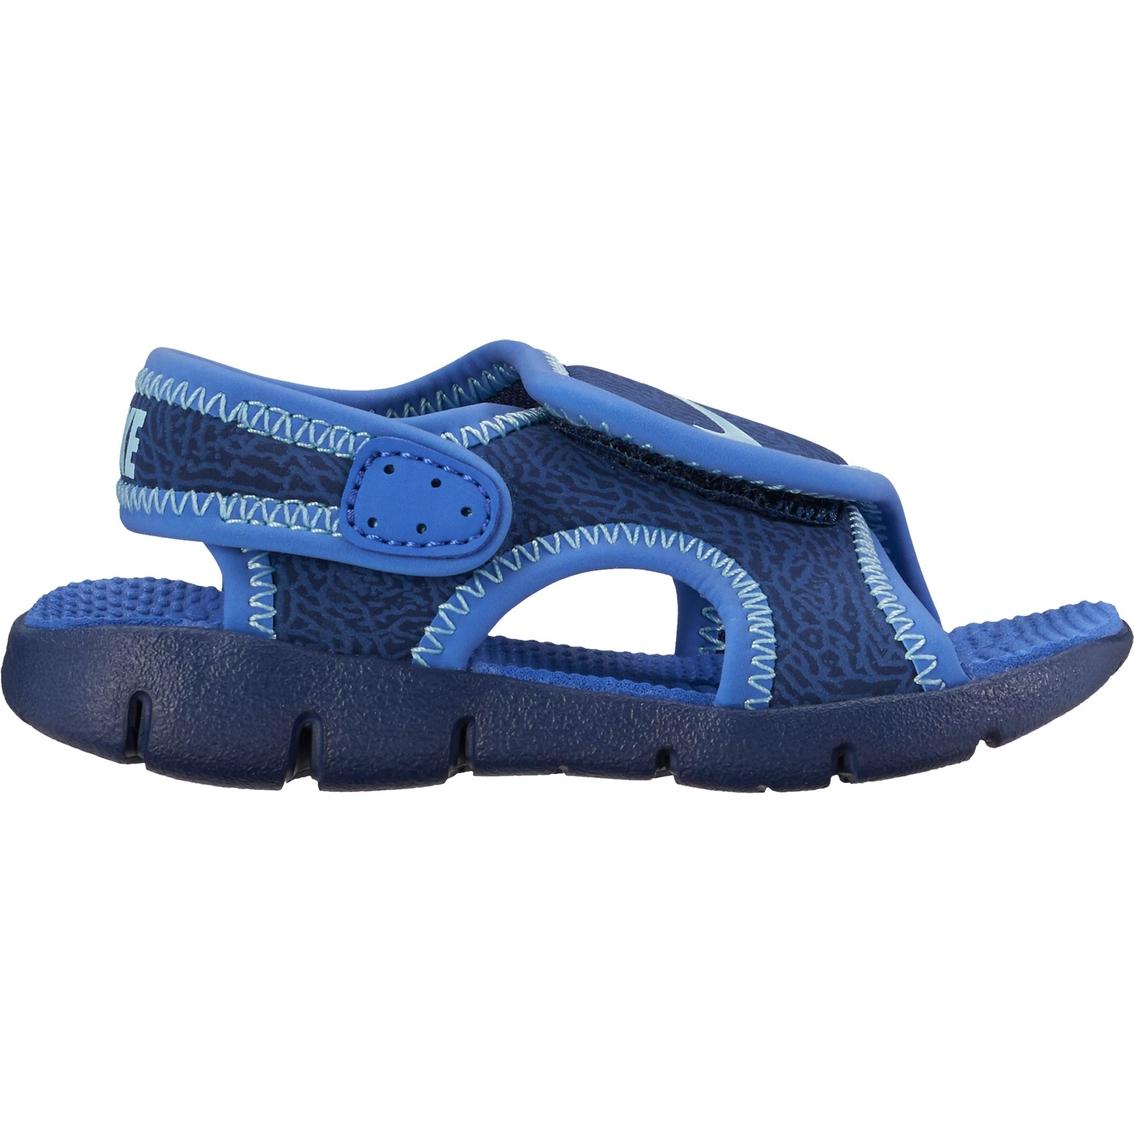 4eb9566b314f Nike Toddler Boys Sunray Adjust 4 Sandals